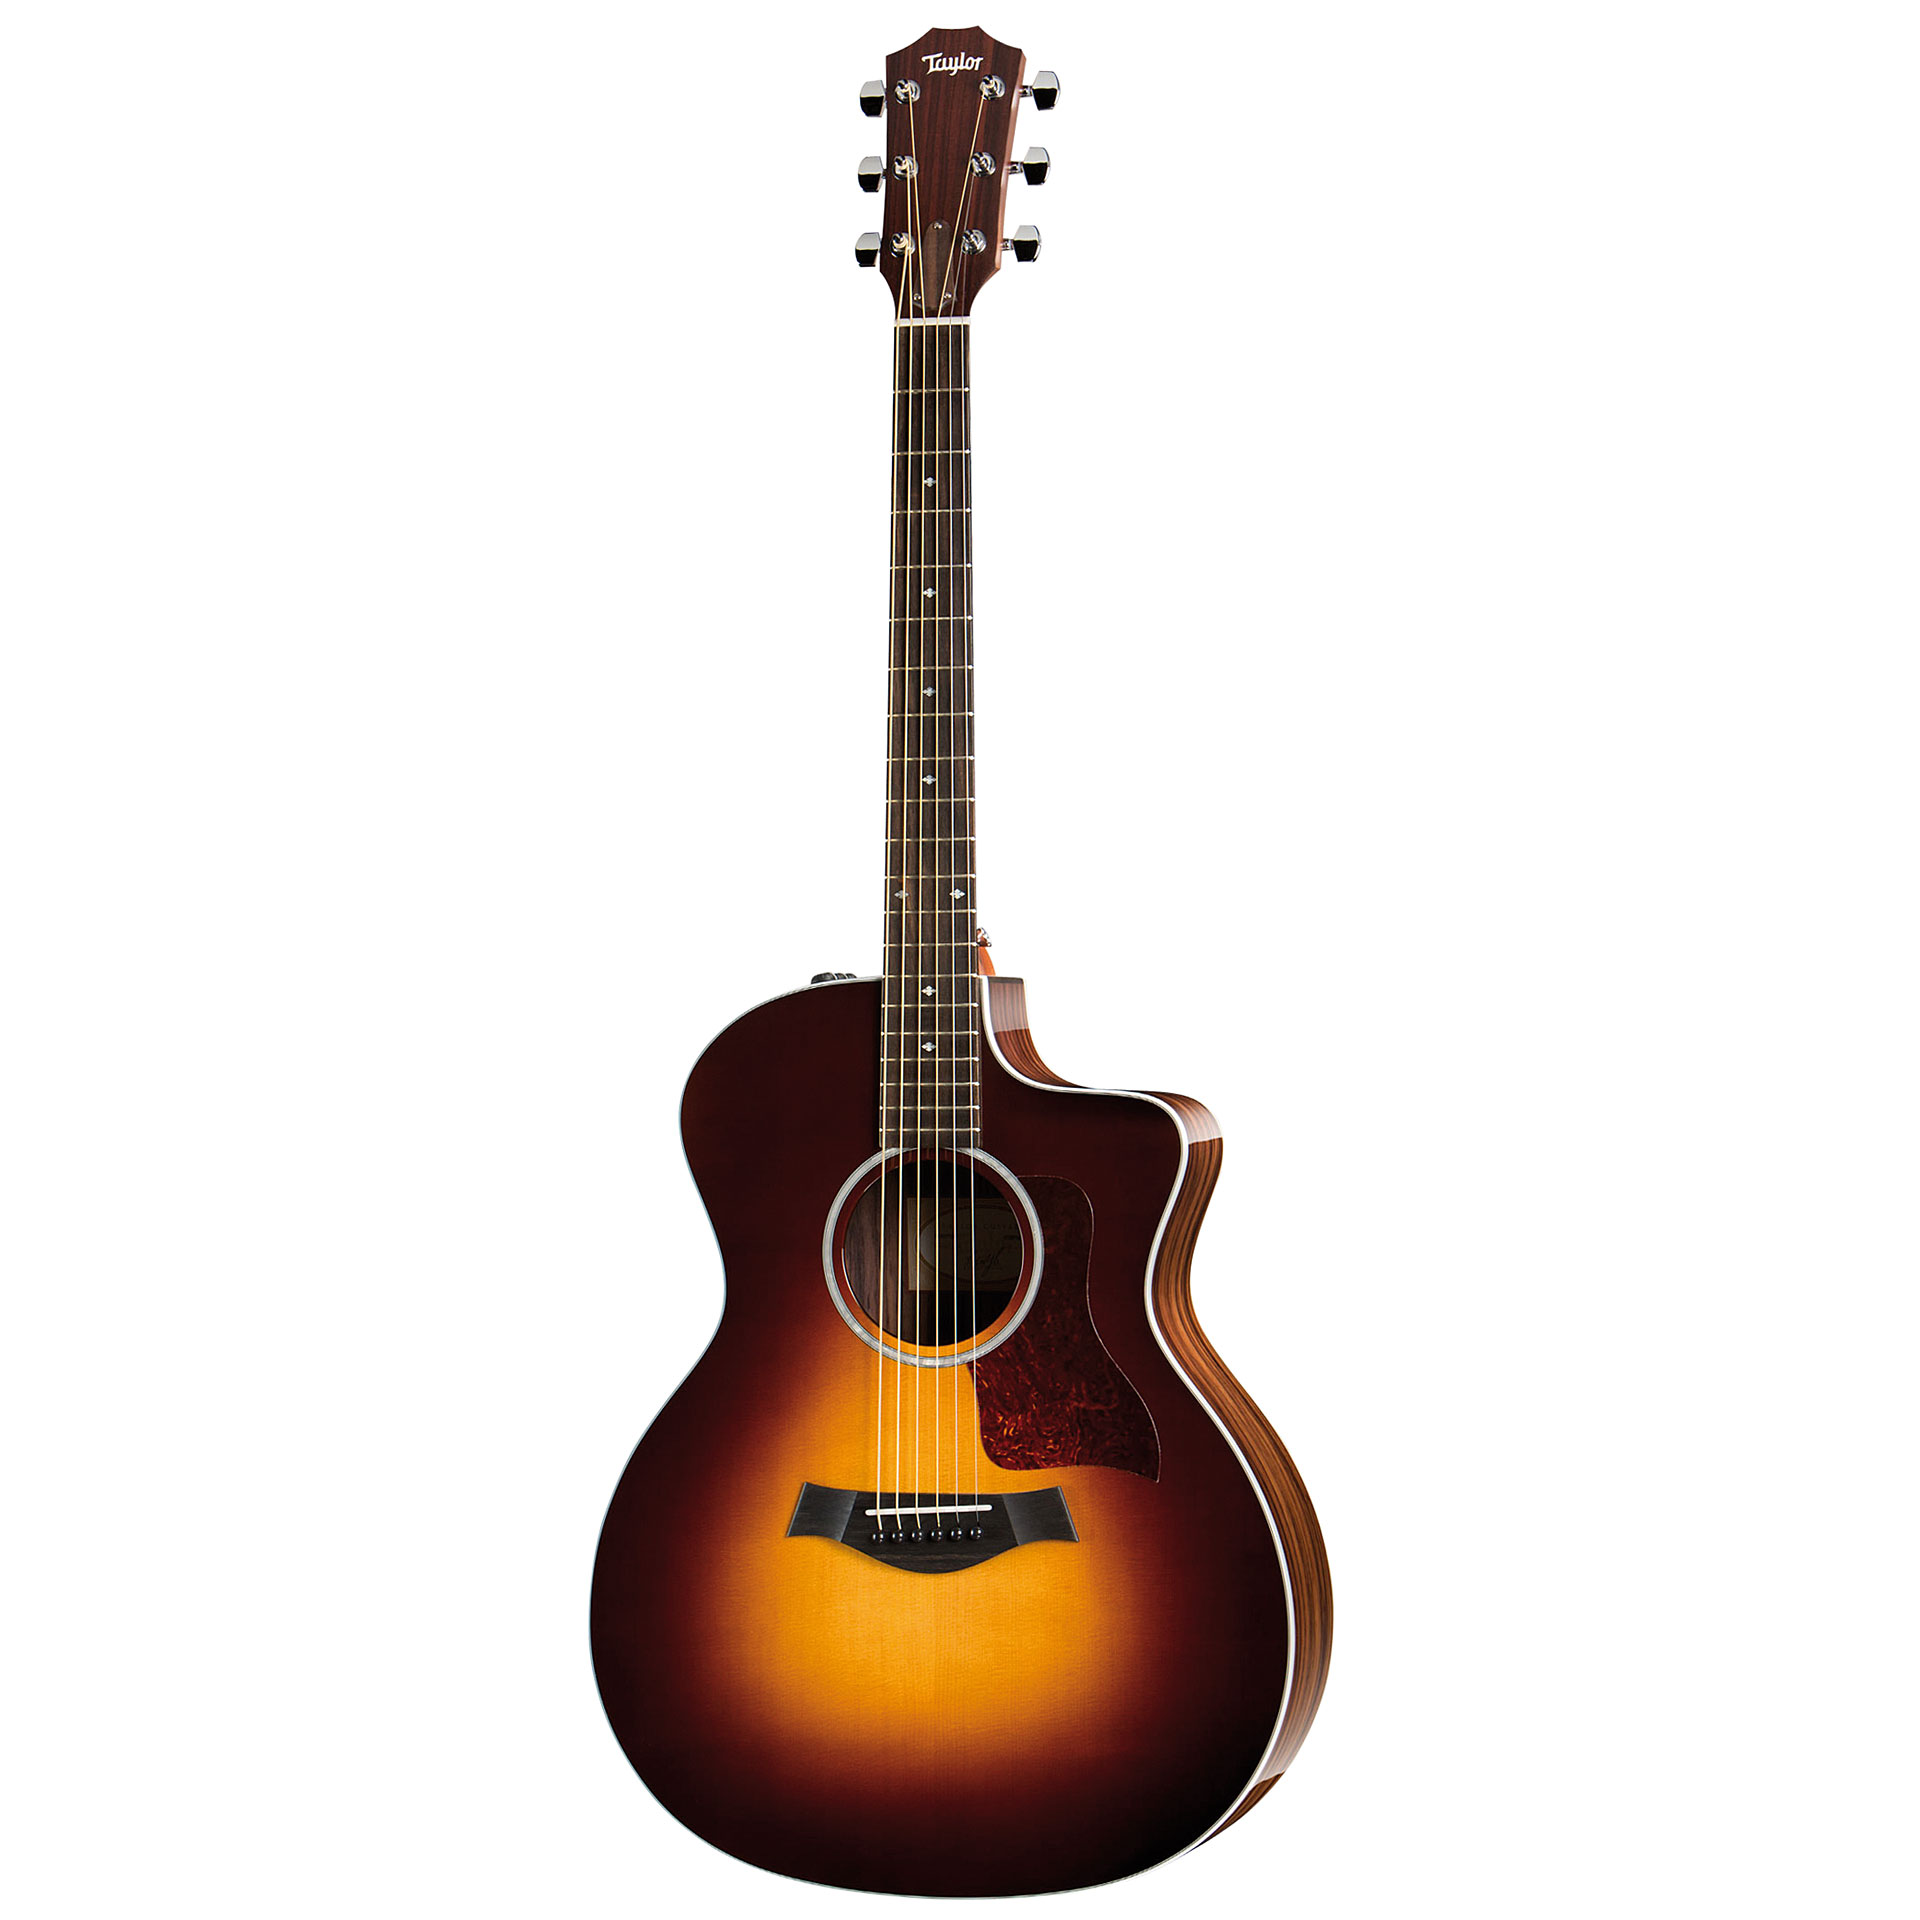 taylor 214ce deluxe sb acoustic guitar. Black Bedroom Furniture Sets. Home Design Ideas